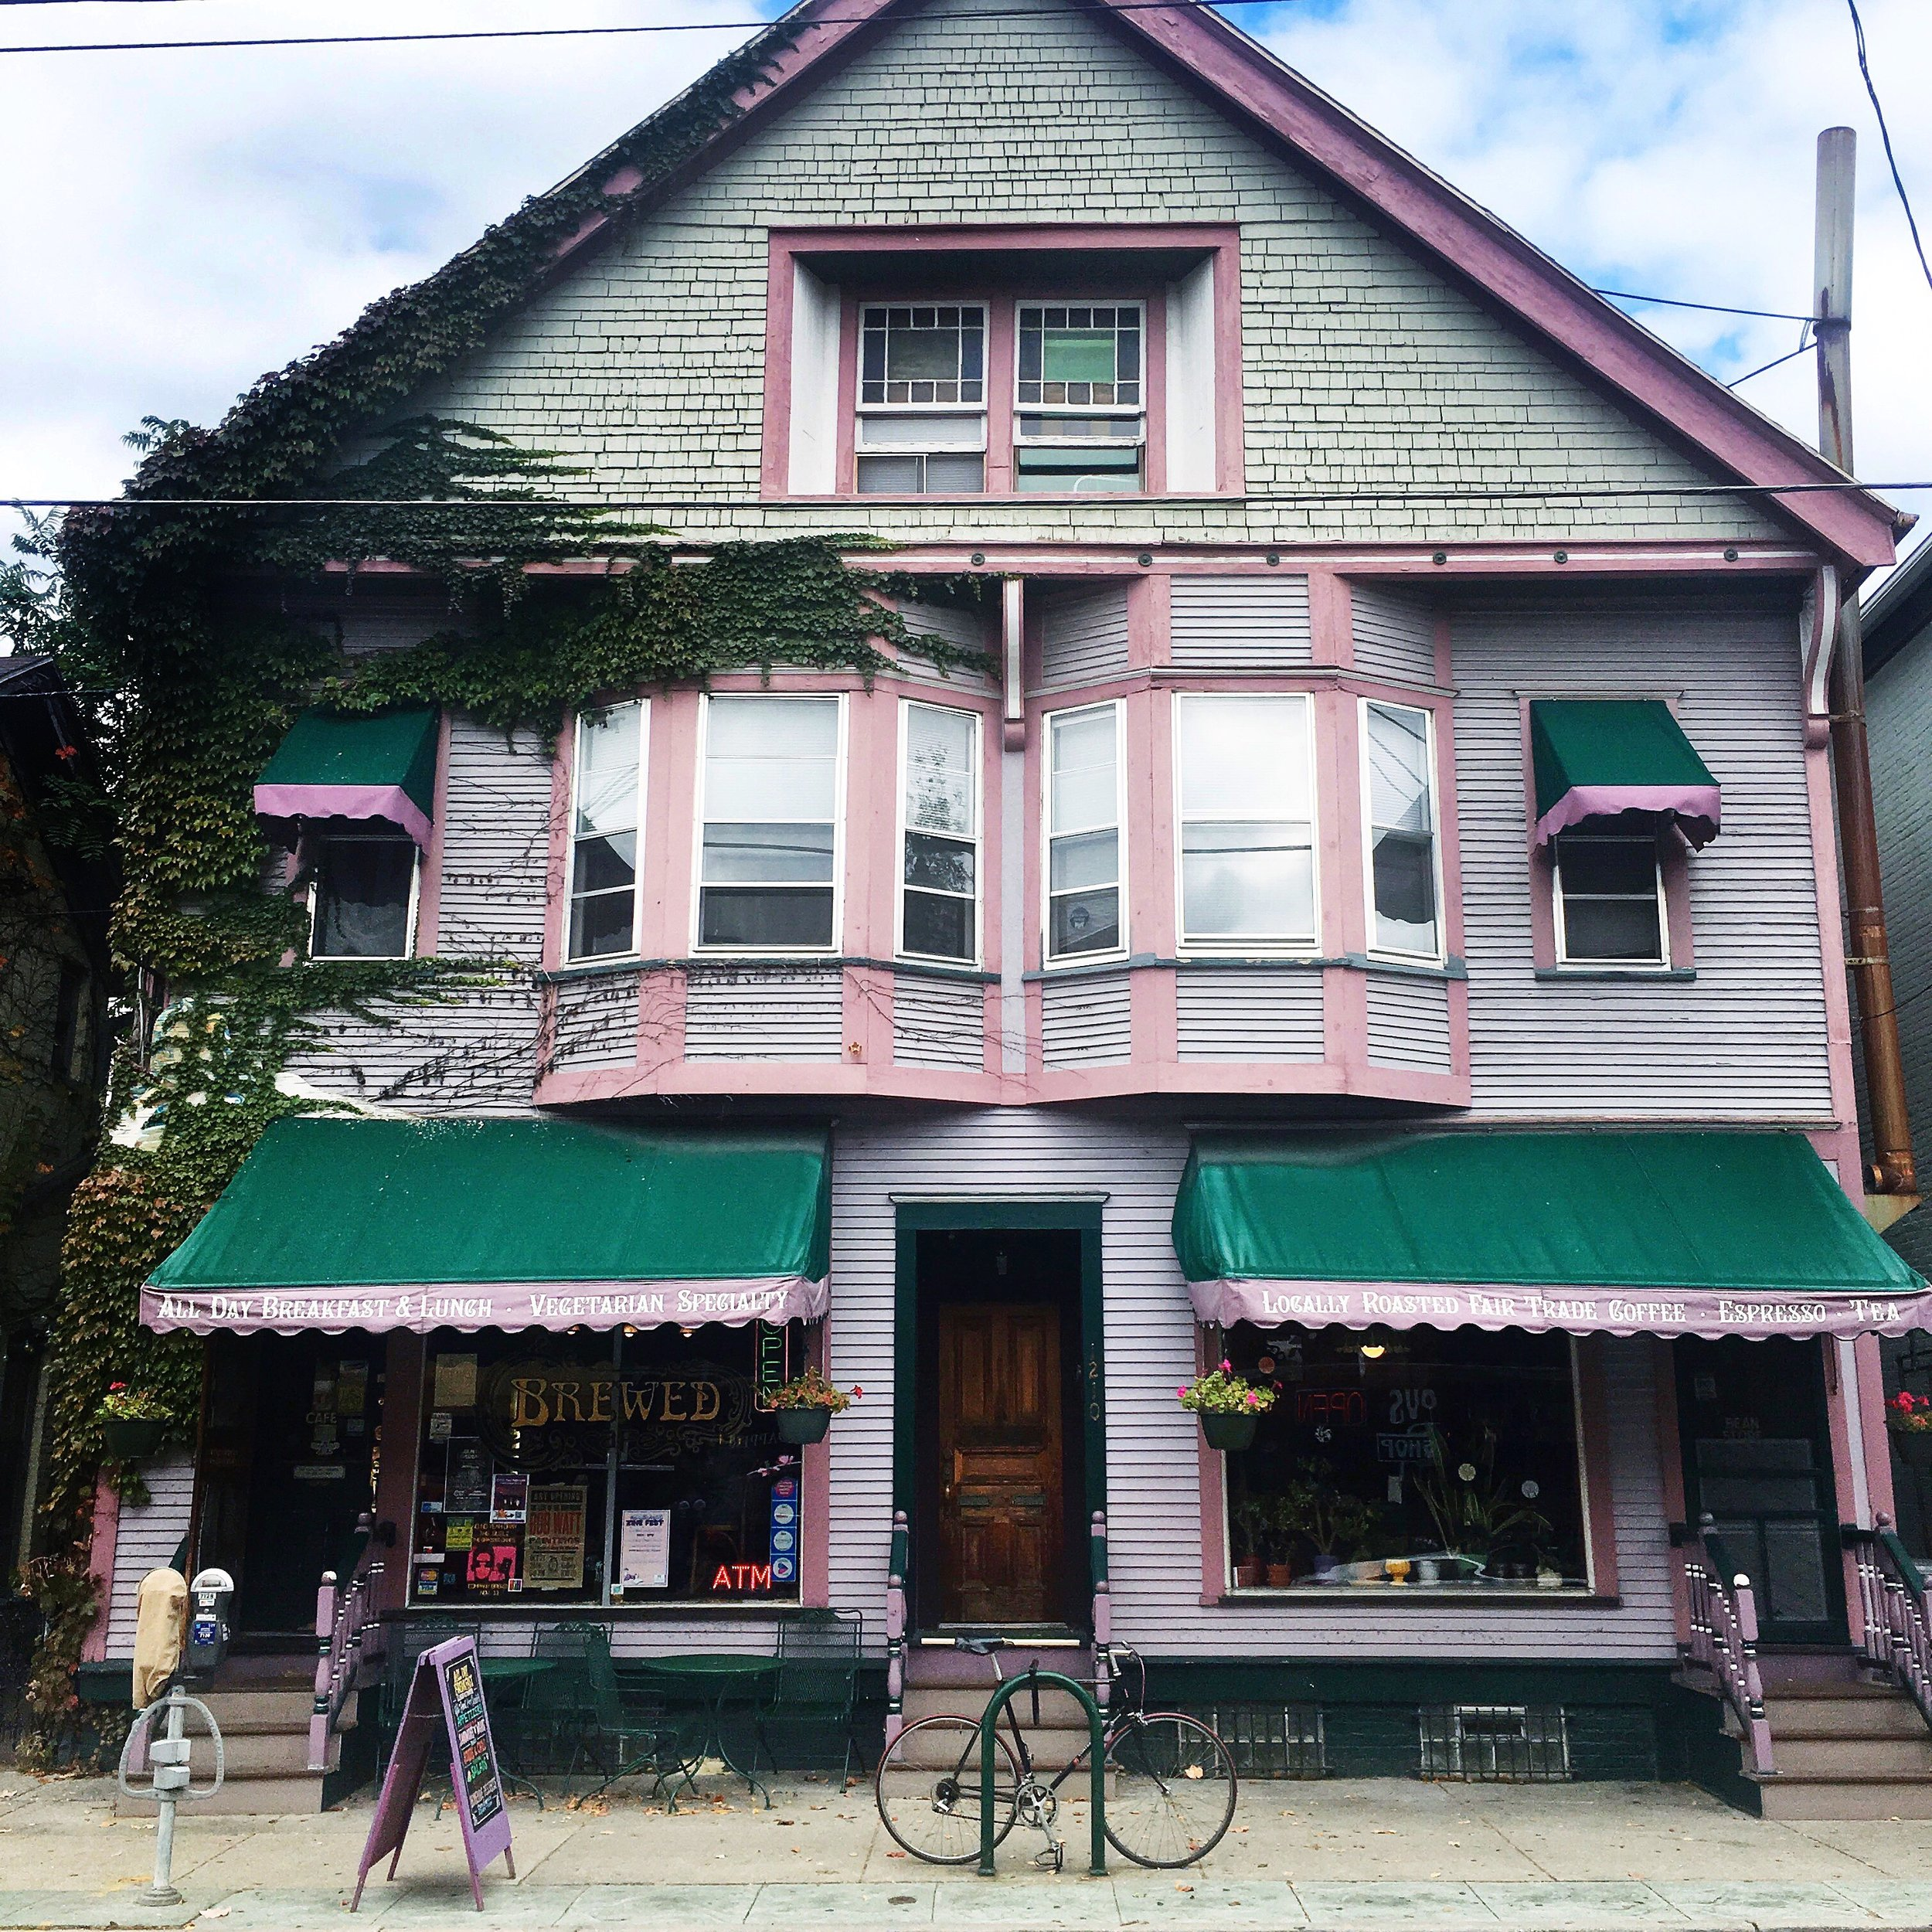 Restaurants along Brady Street